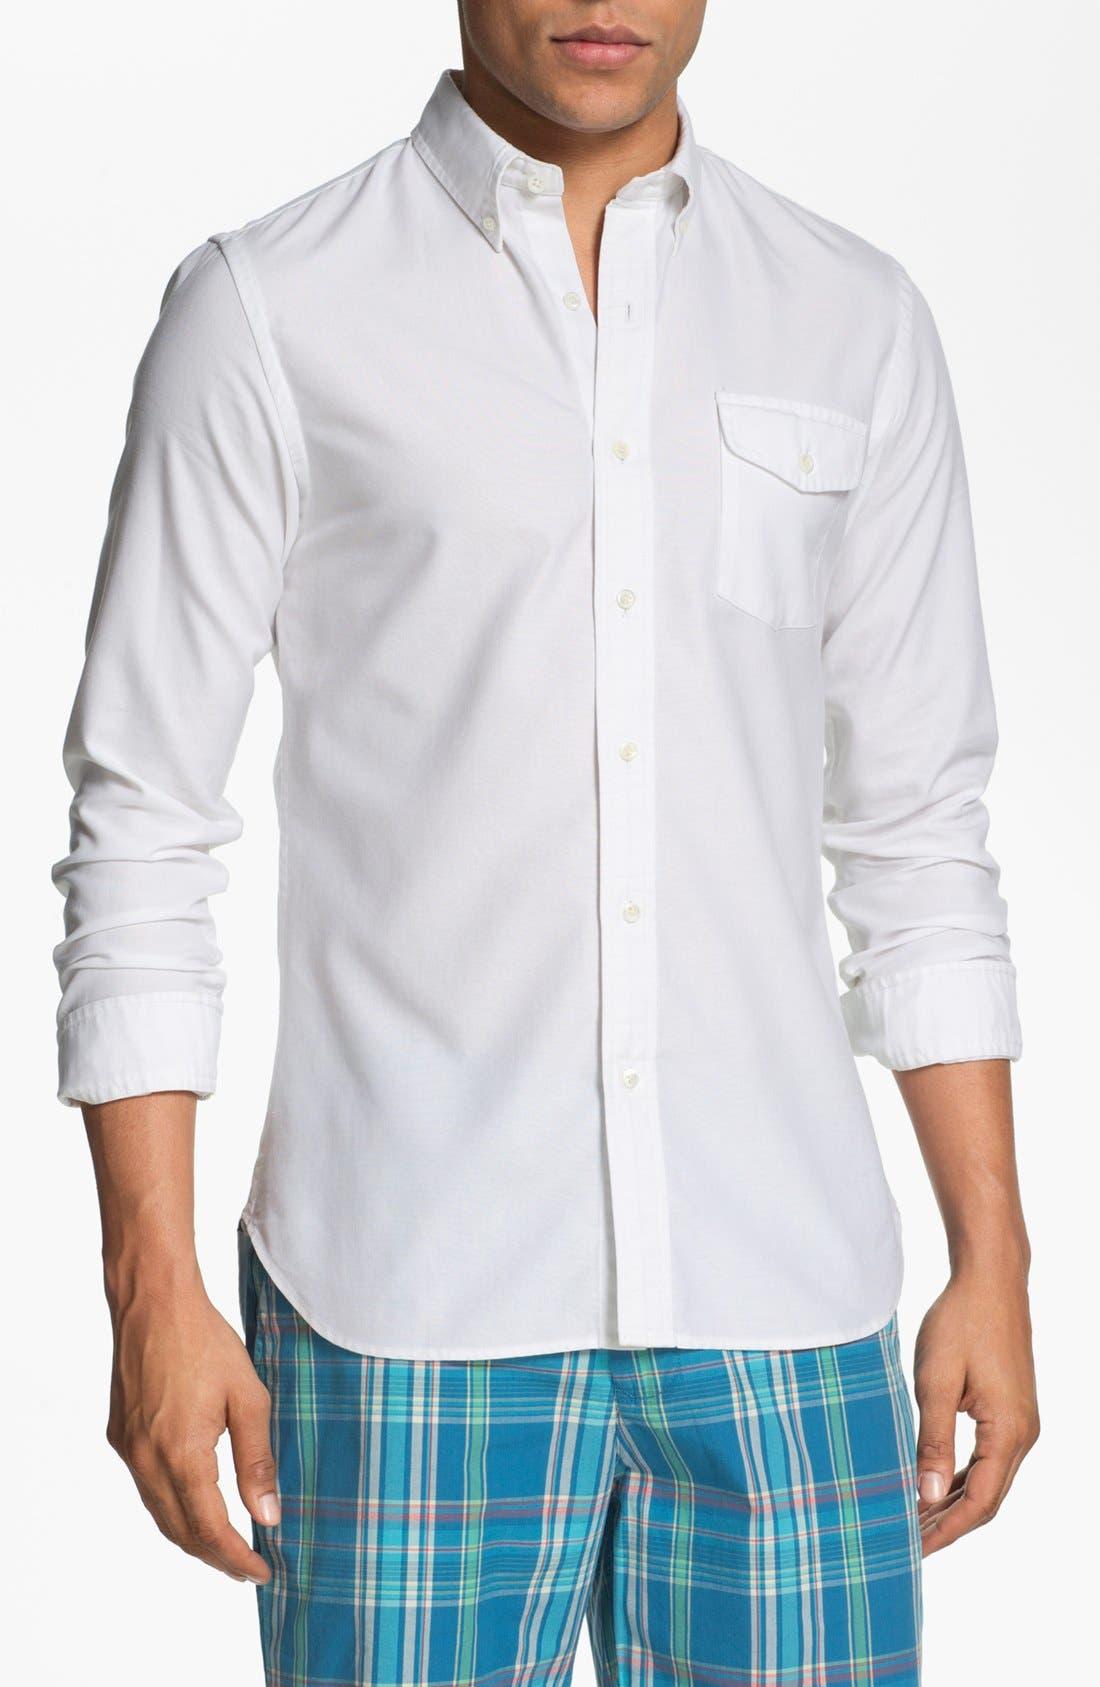 Alternate Image 1 Selected - J. Press York Street Regular Fit Oxford Sport Shirt